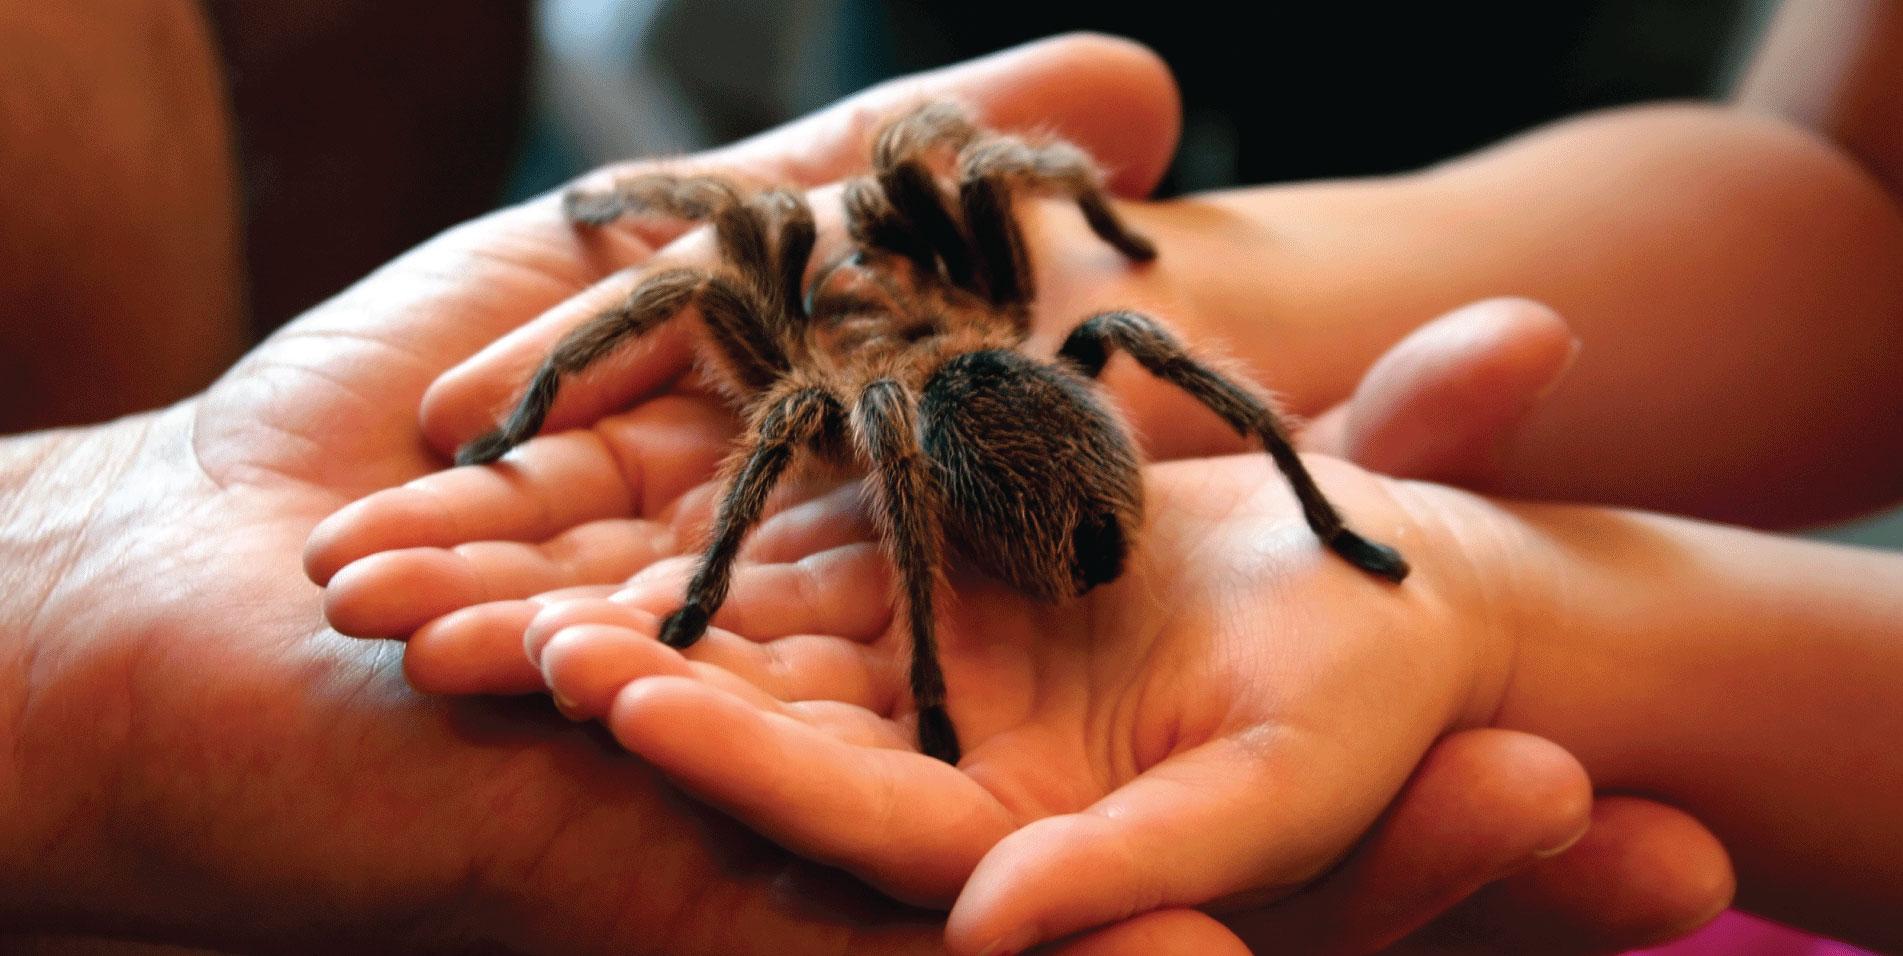 Hands holding a tarantula spider.